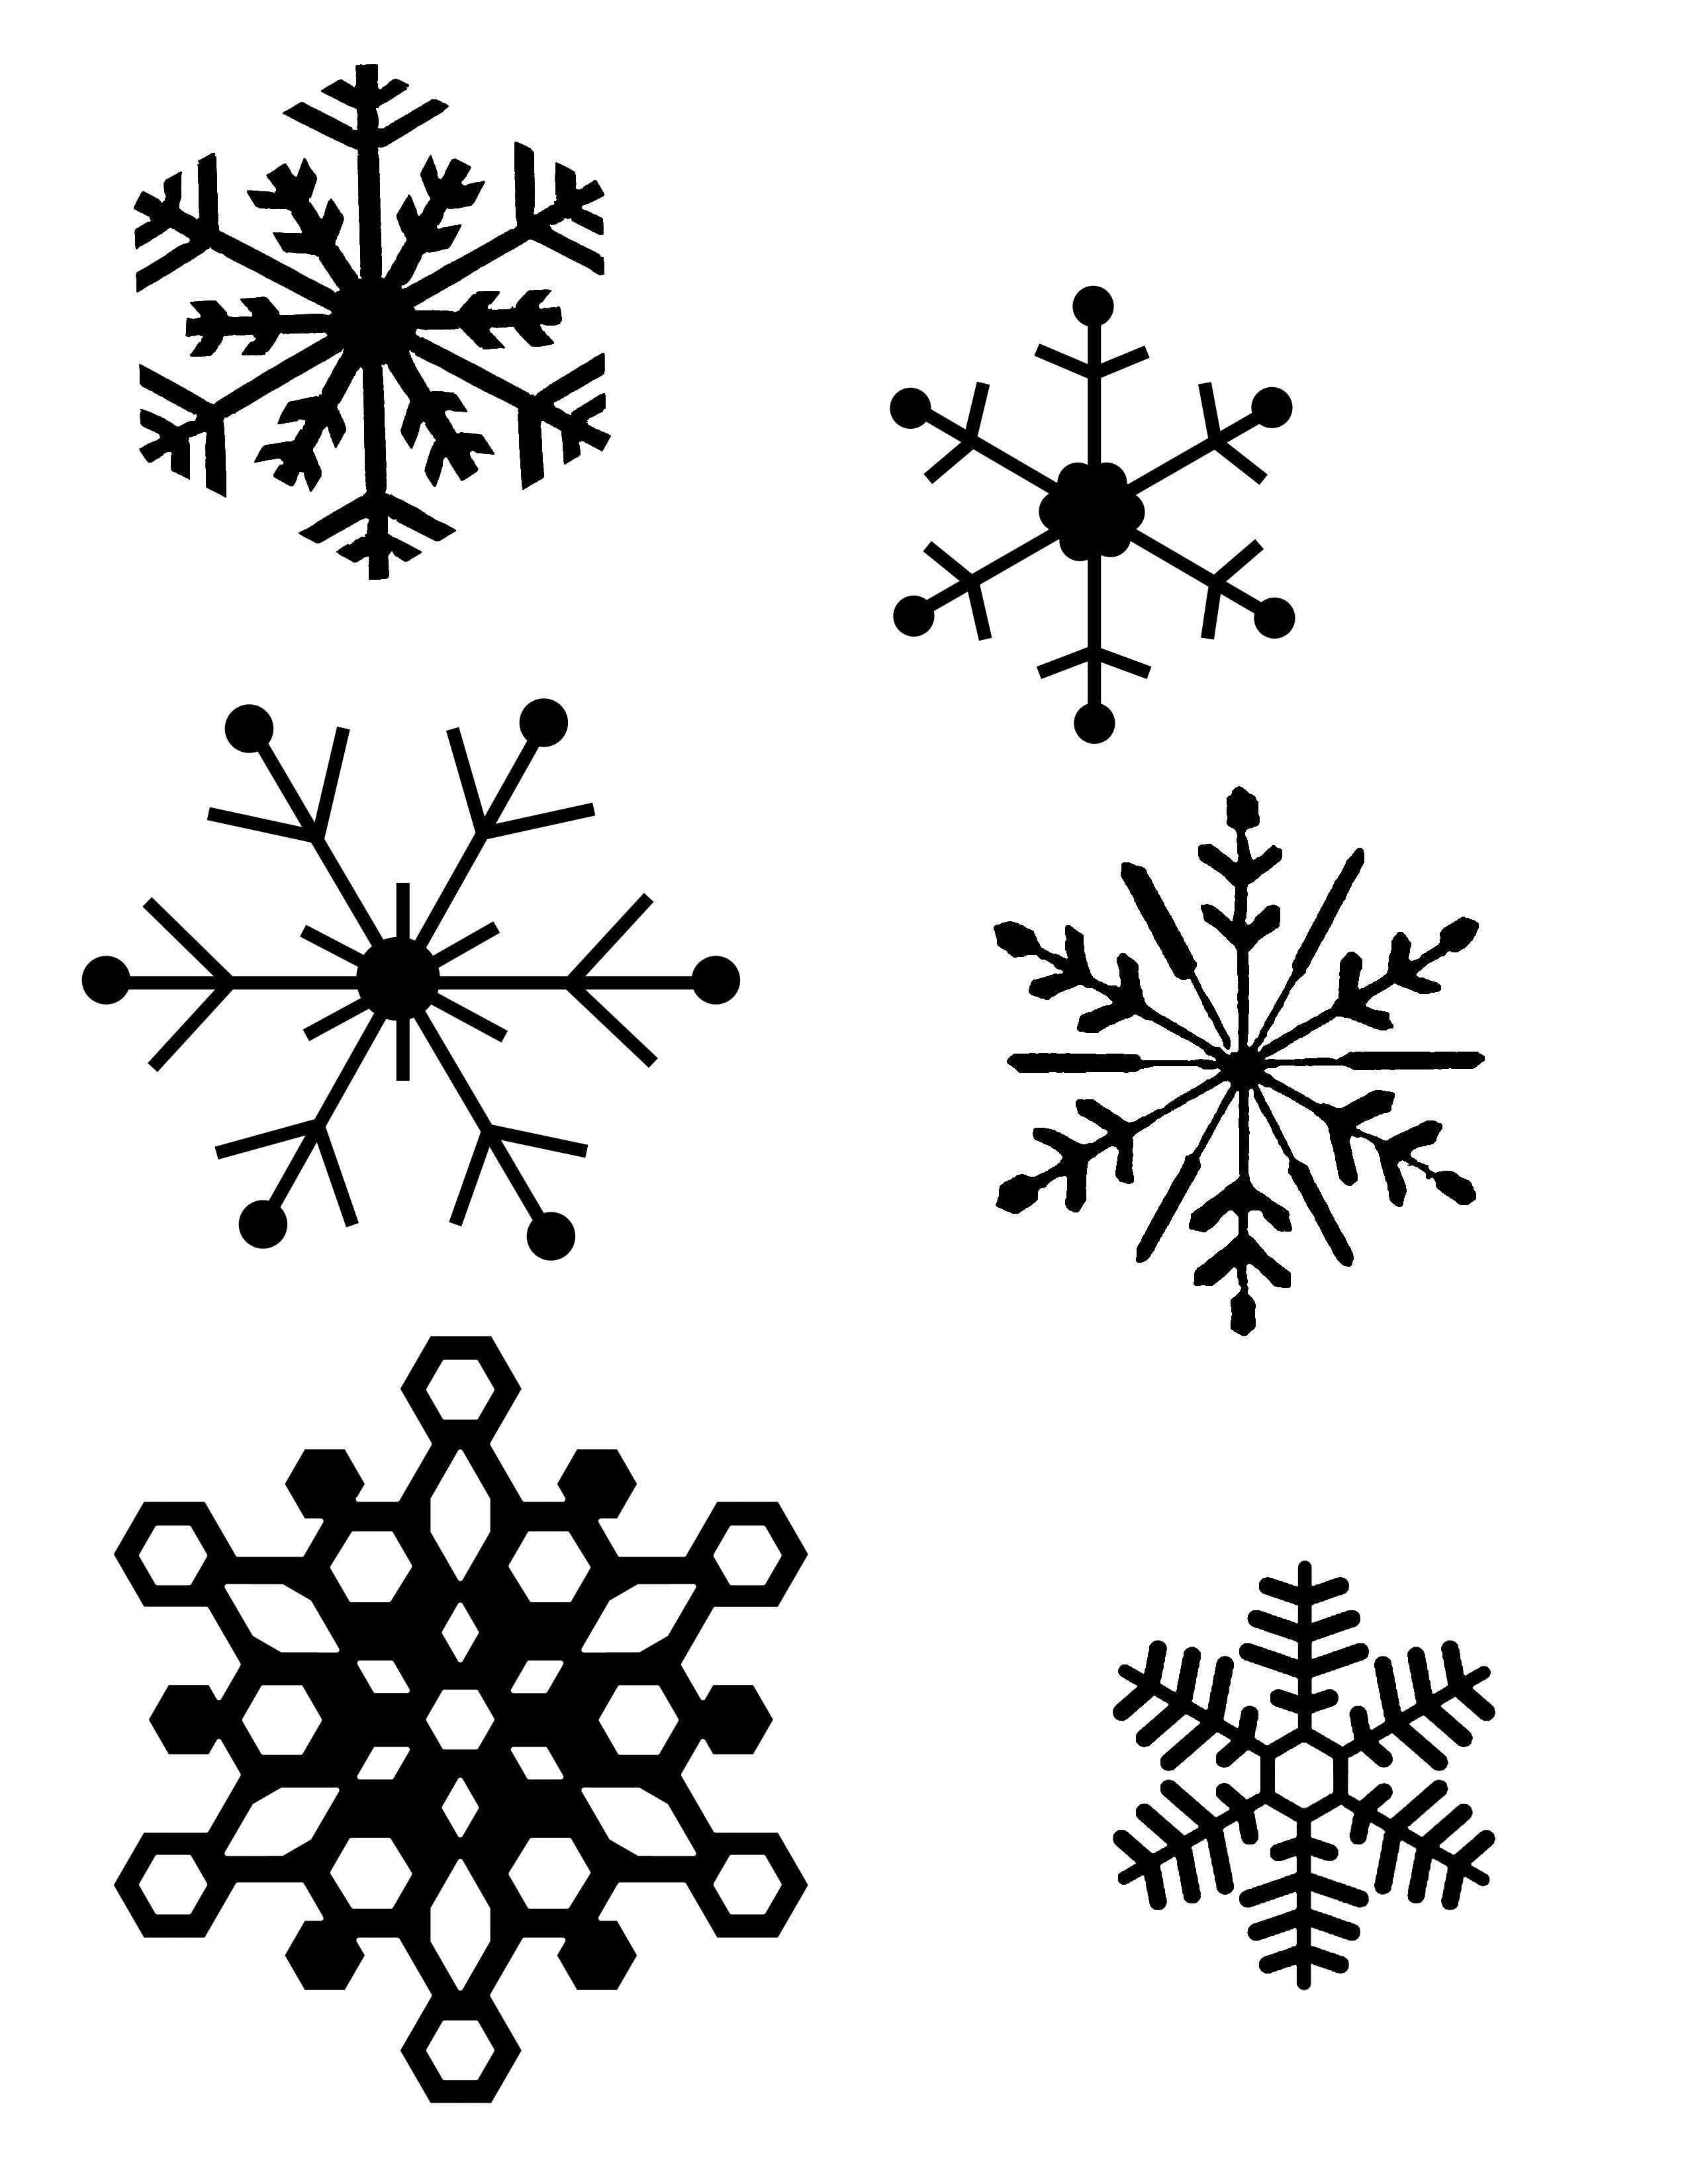 Snowflake Patterns (For Hot Glue Gun Snowflakes) I Think I Will Be - Free Printable Snowflake Patterns